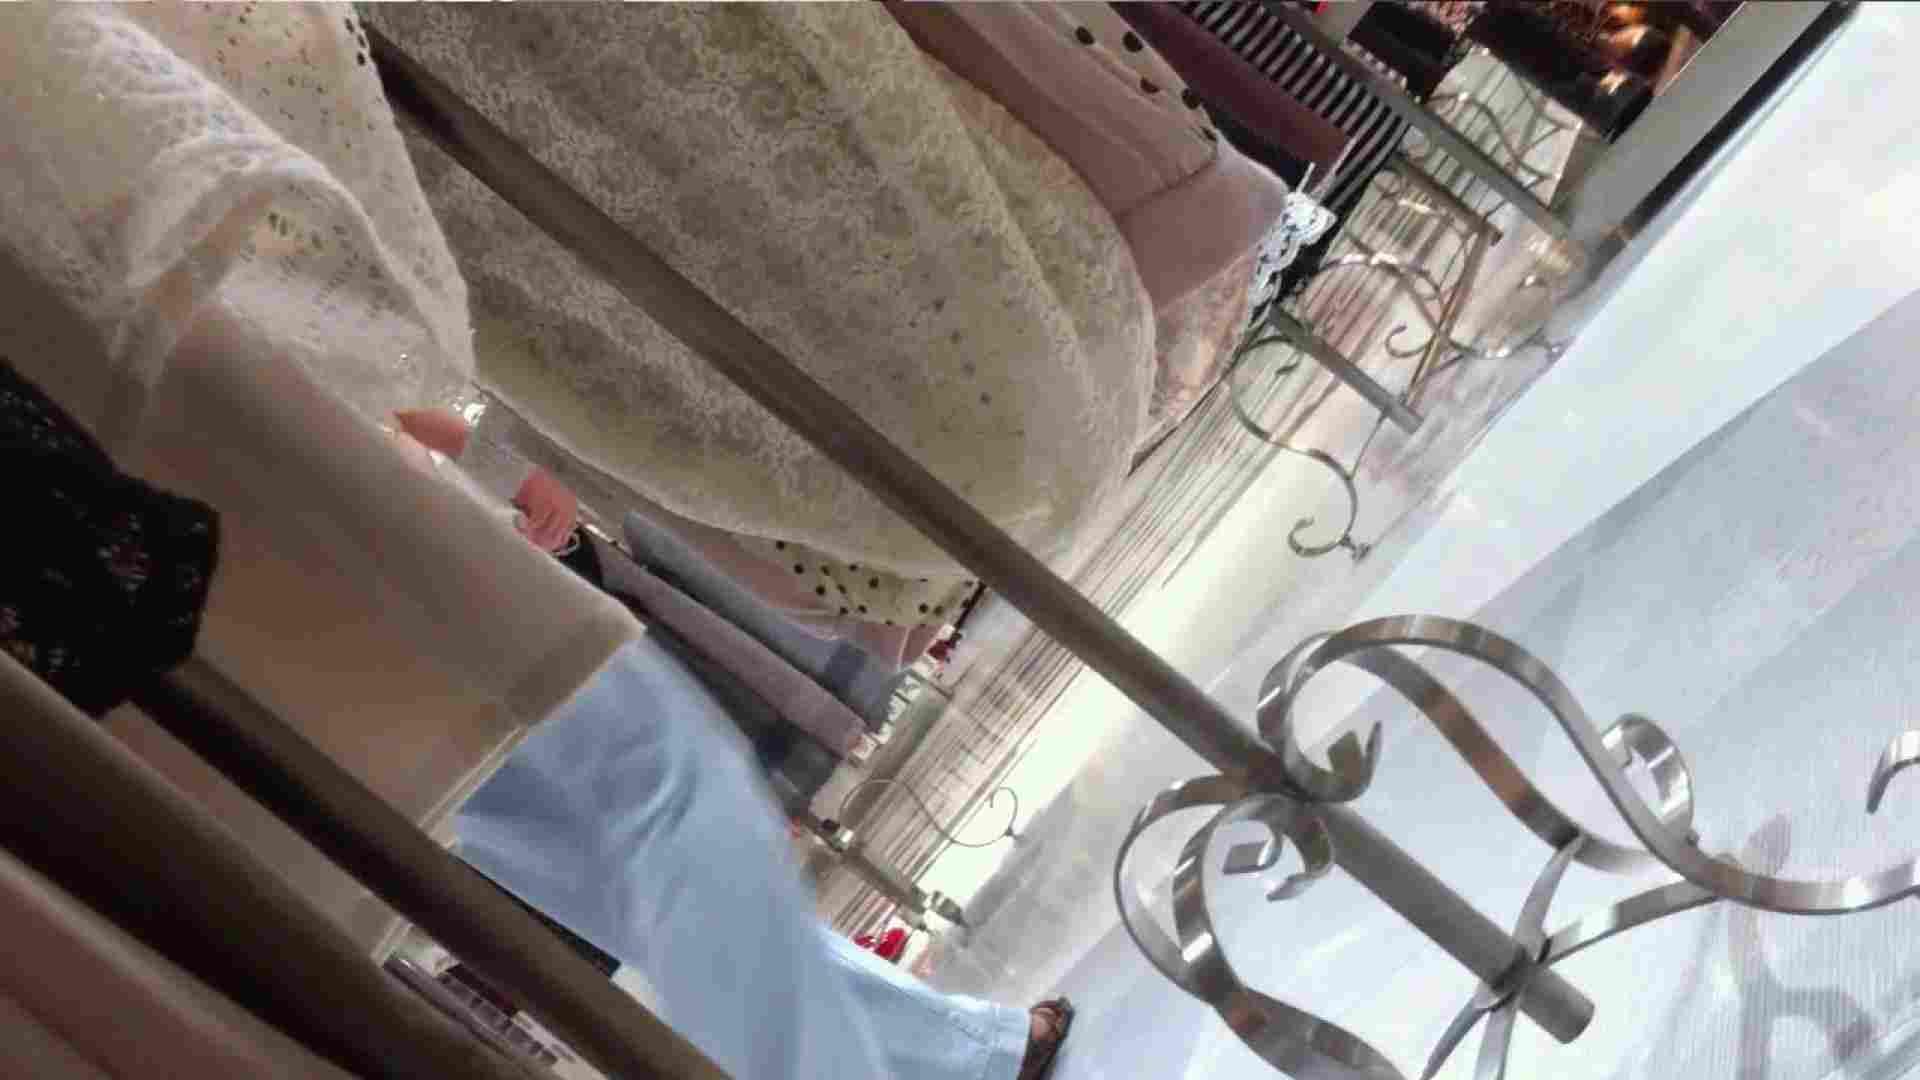 vol.33 美人アパレル胸チラ&パンチラ ギャル系ネーチャンの下着 接写 おまんこ動画流出 92pic 4